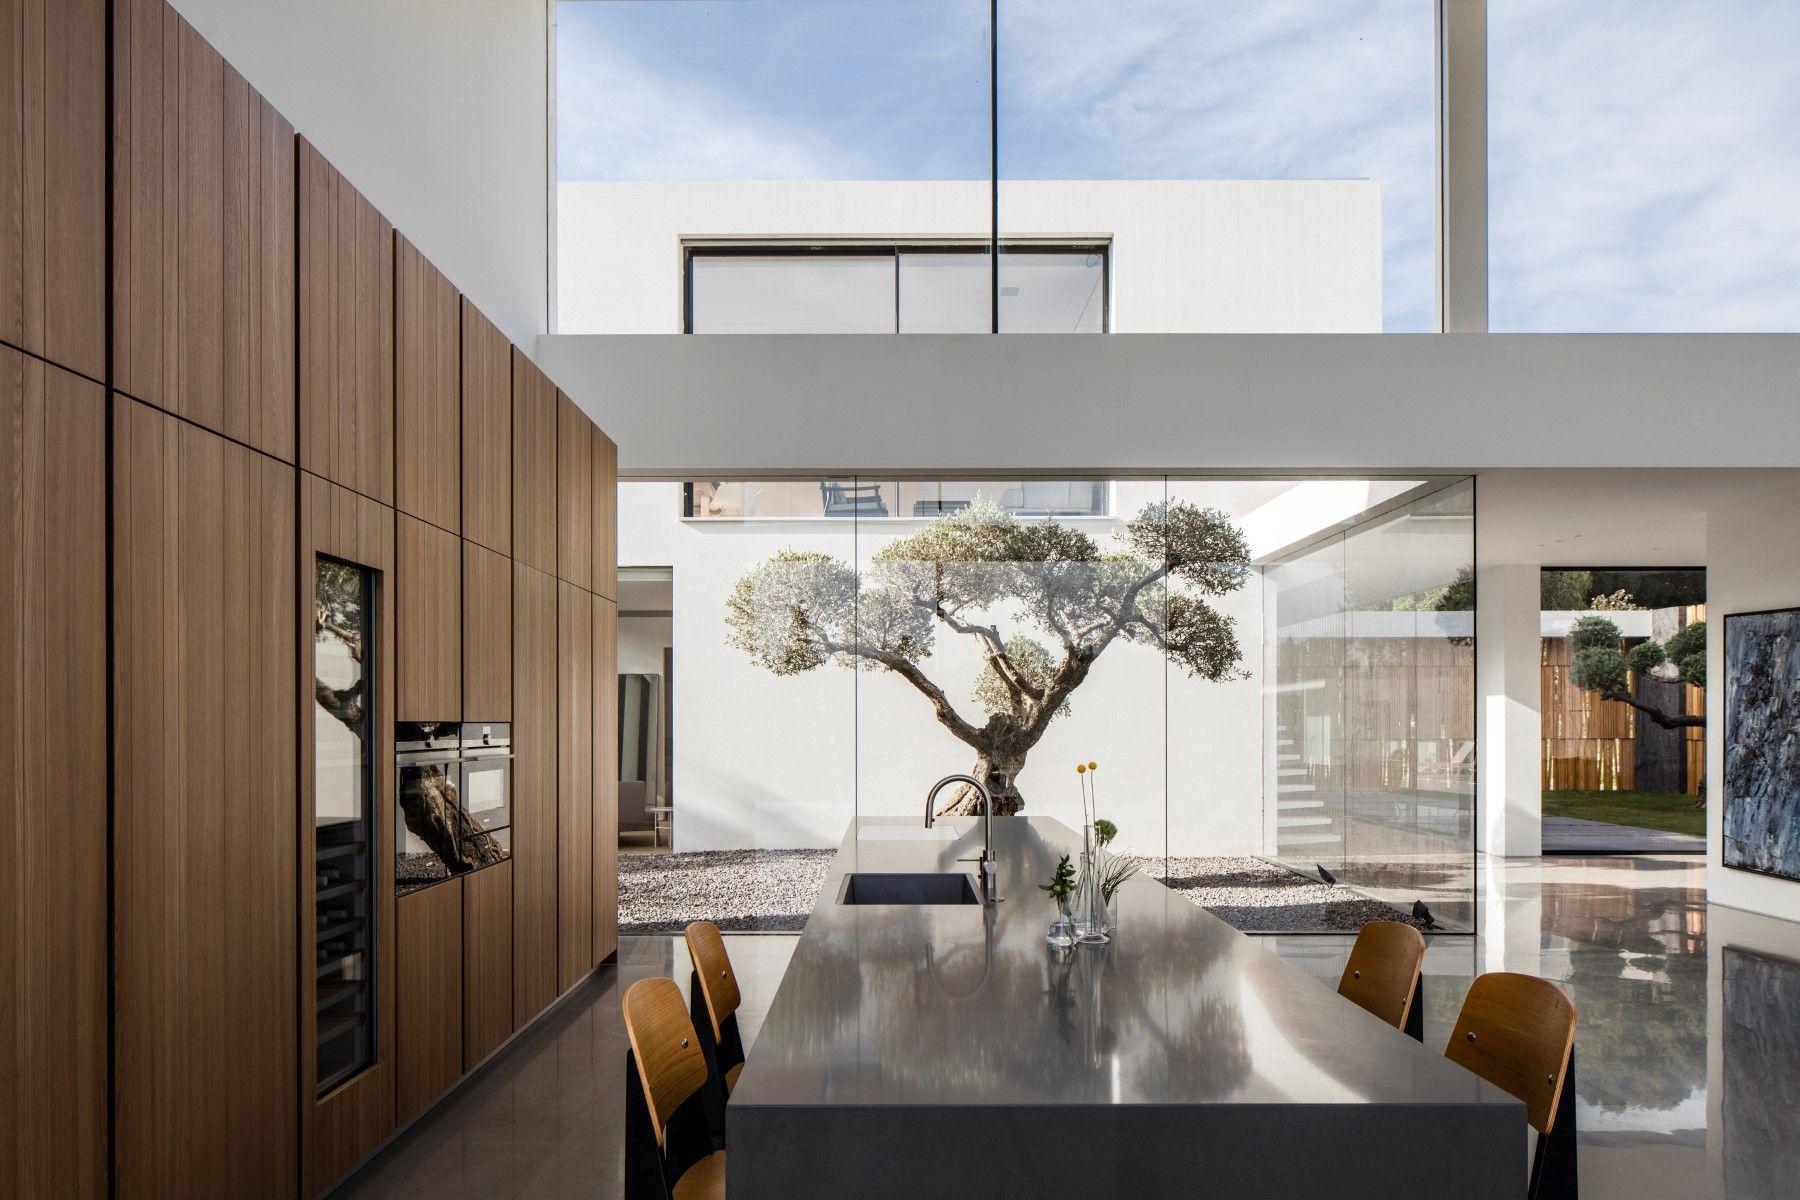 F house by pitsou kedem architects architecture u design house